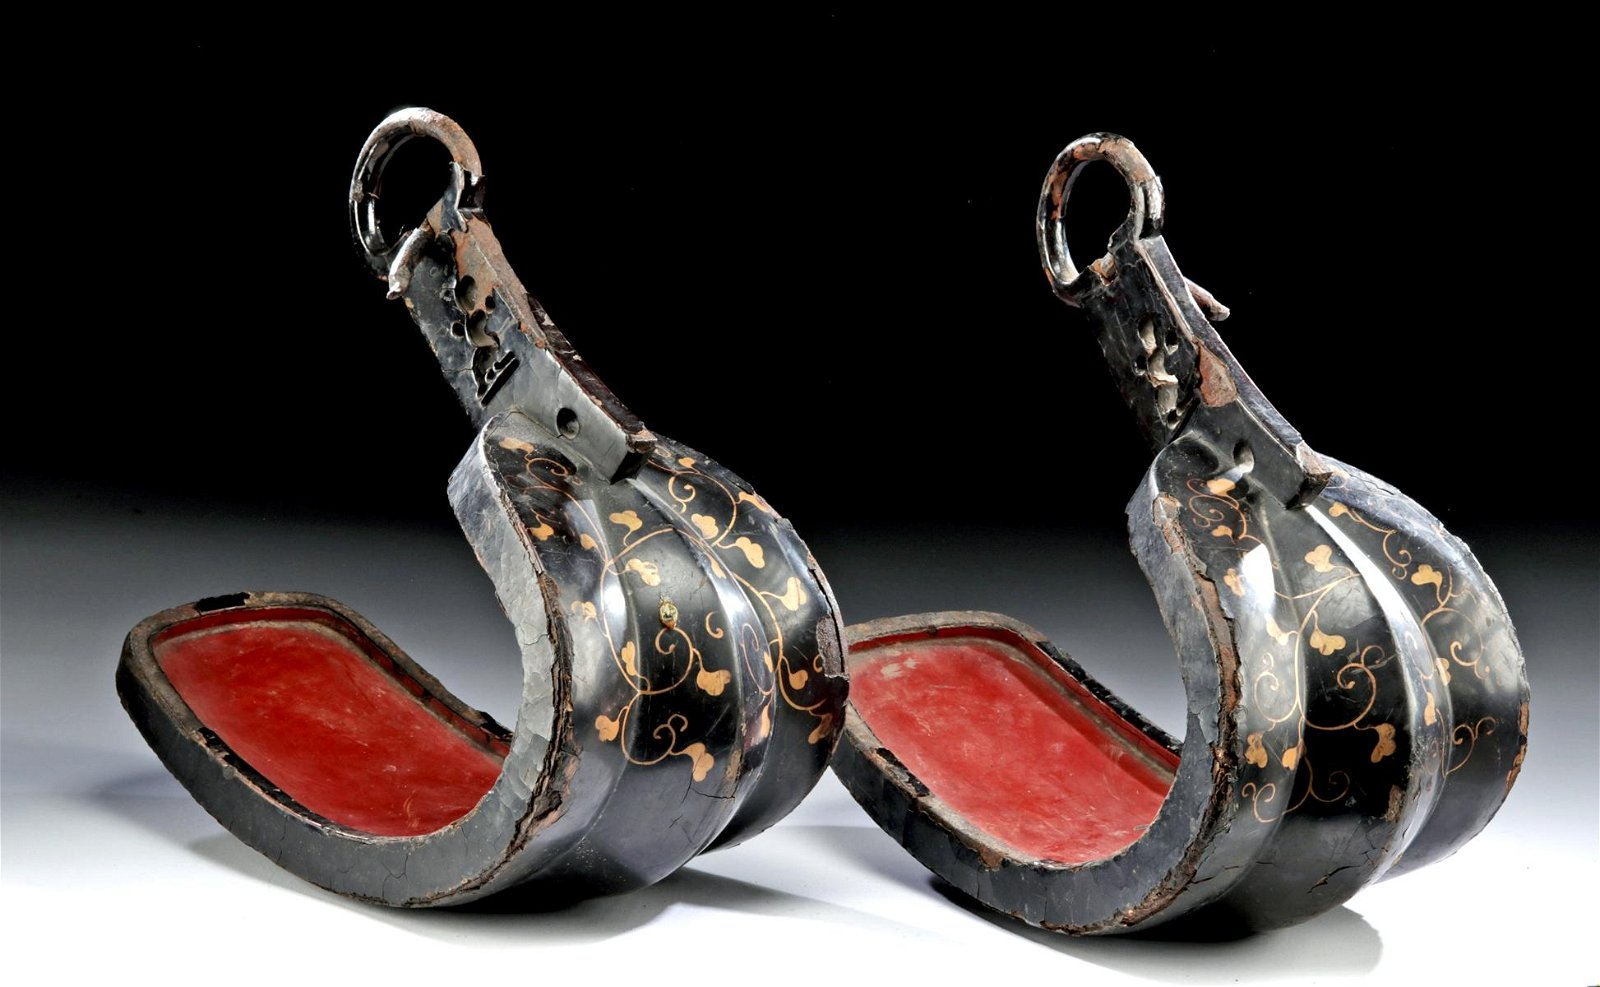 17th C. Japanese Edo Lacquered Iron Stirrups (Abumi)